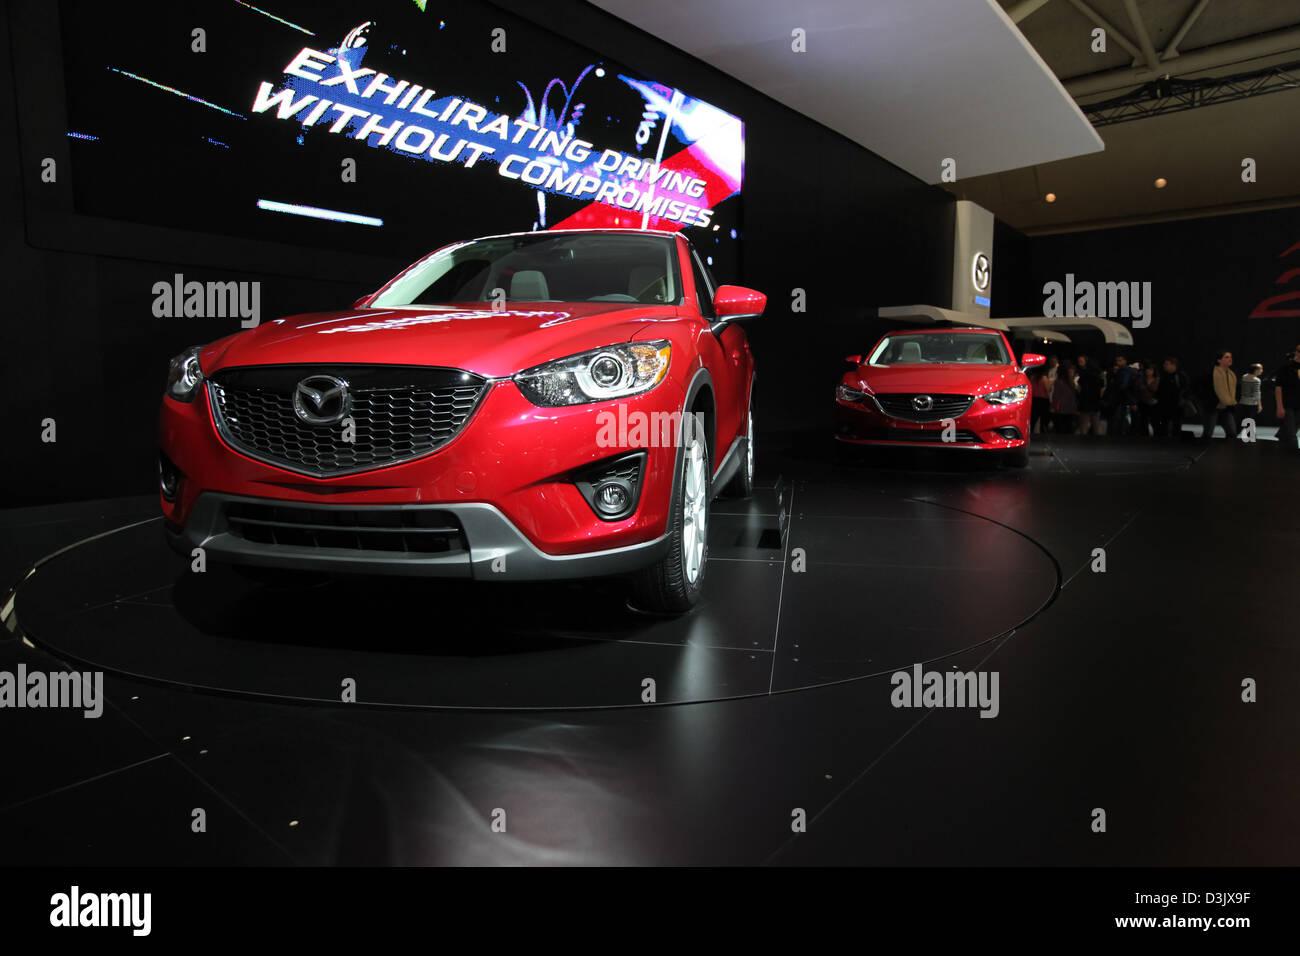 Mazda Garage Rotterdam : Mazda autos stockfotos mazda autos bilder alamy